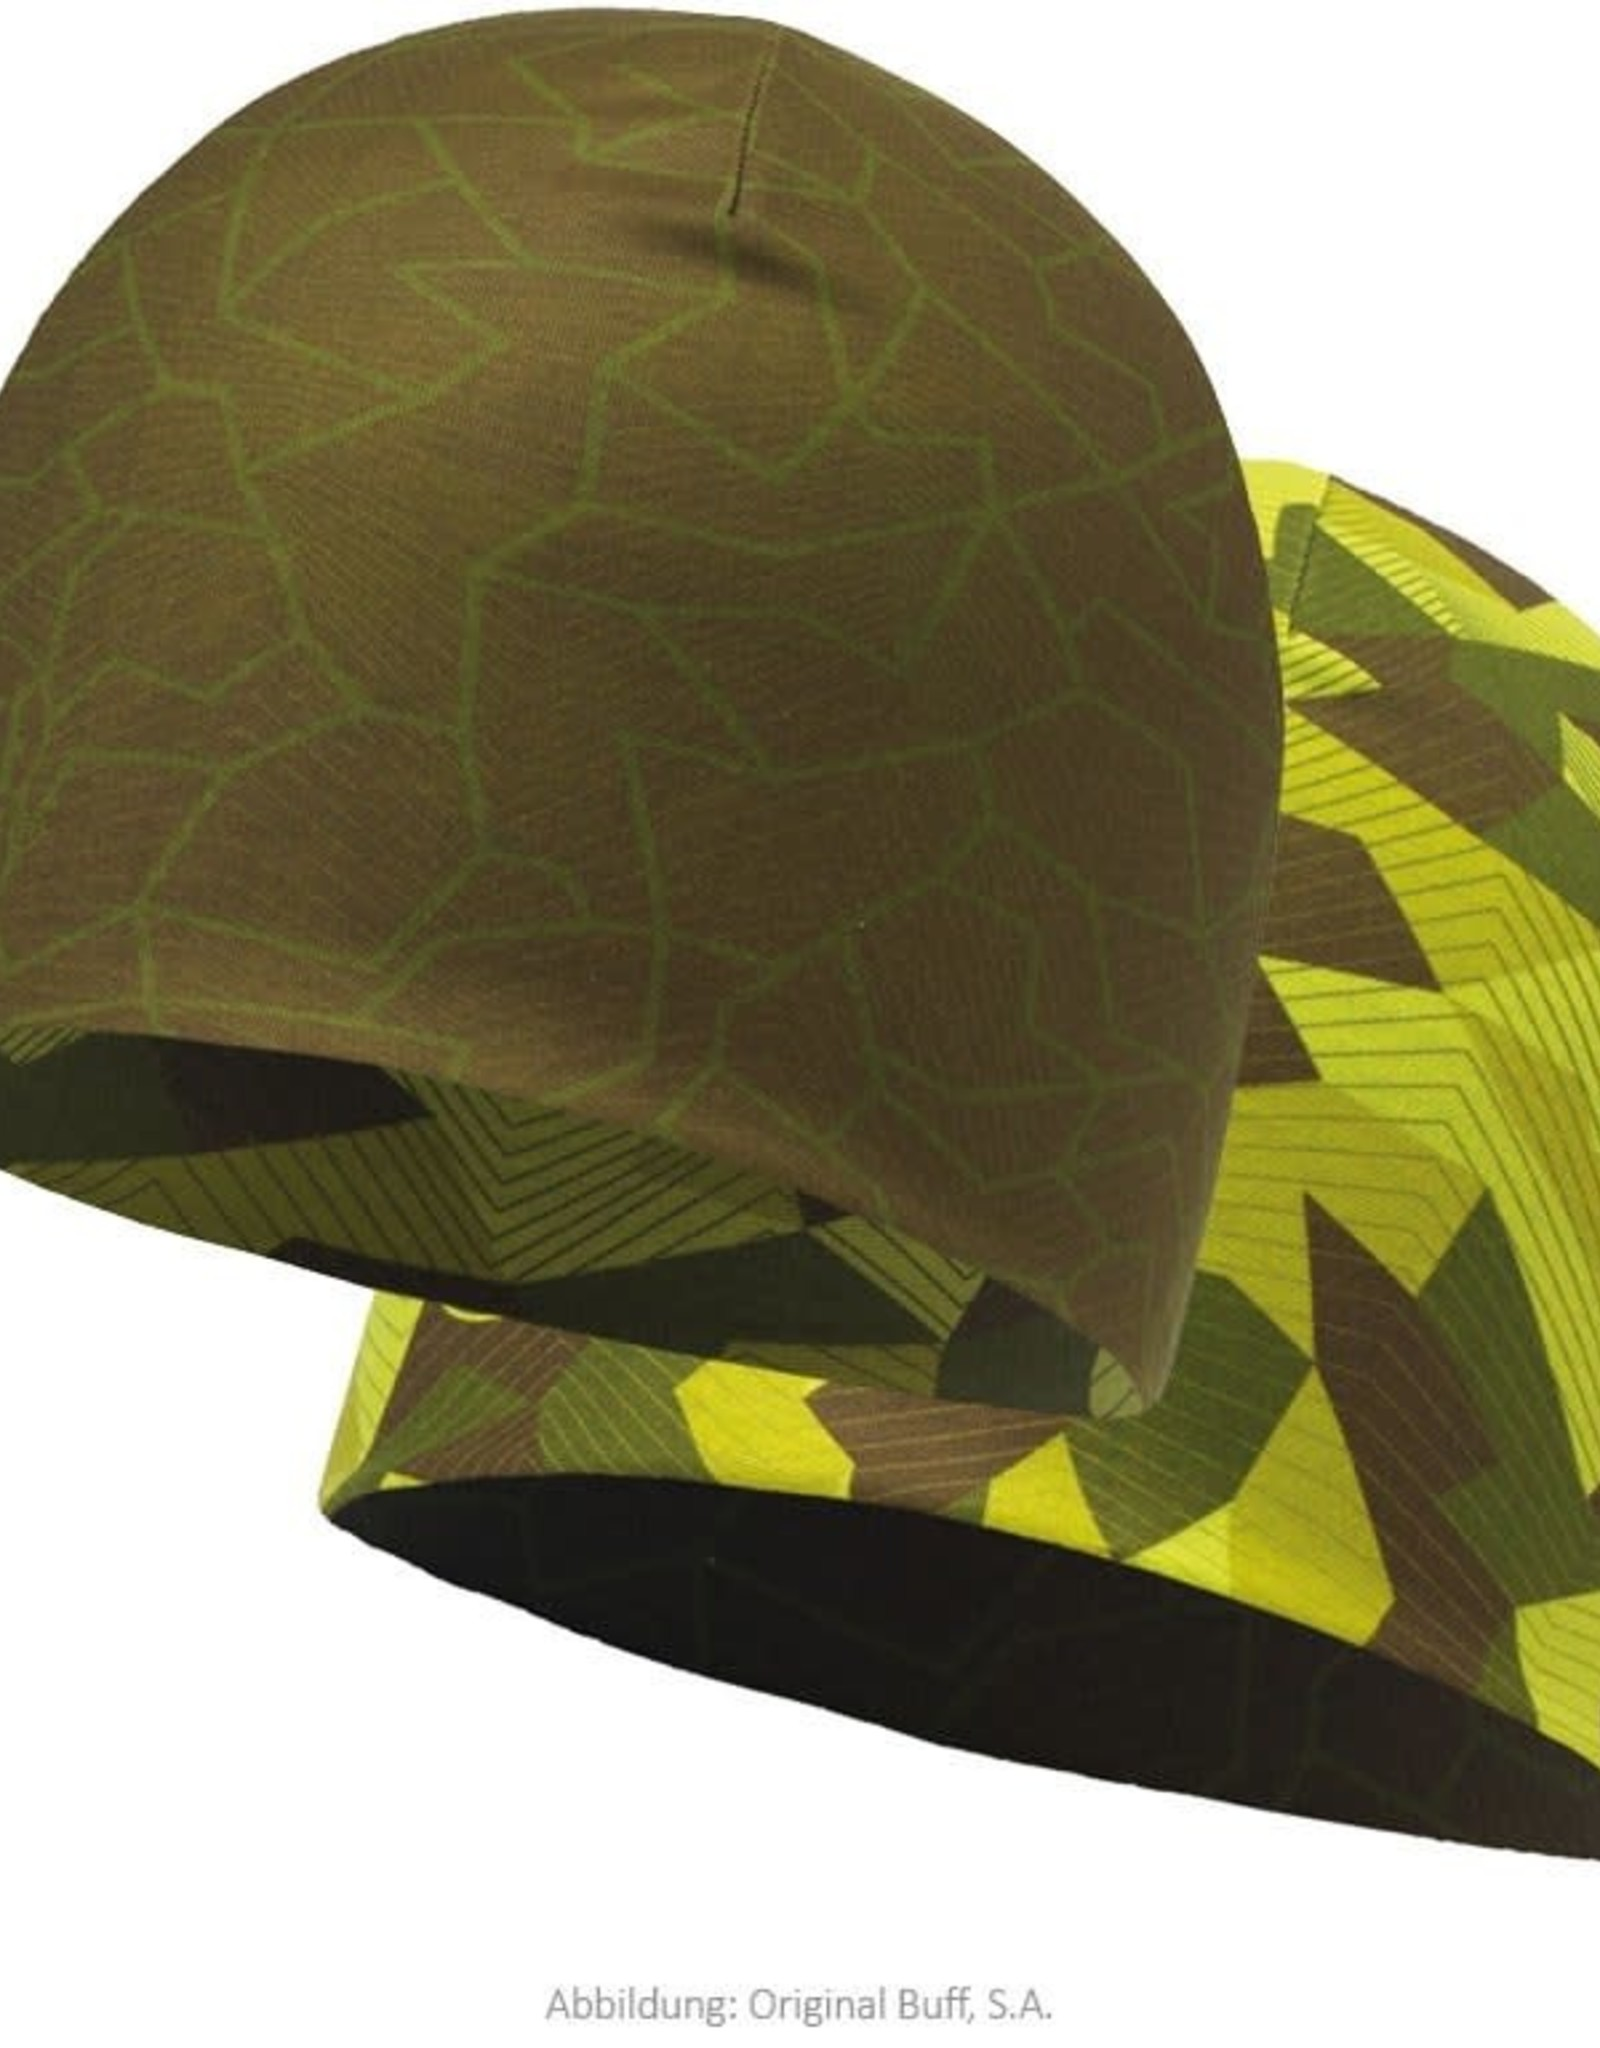 BUFF BUFF- MICROFIBER REVERS HAT-CAMO GREEN